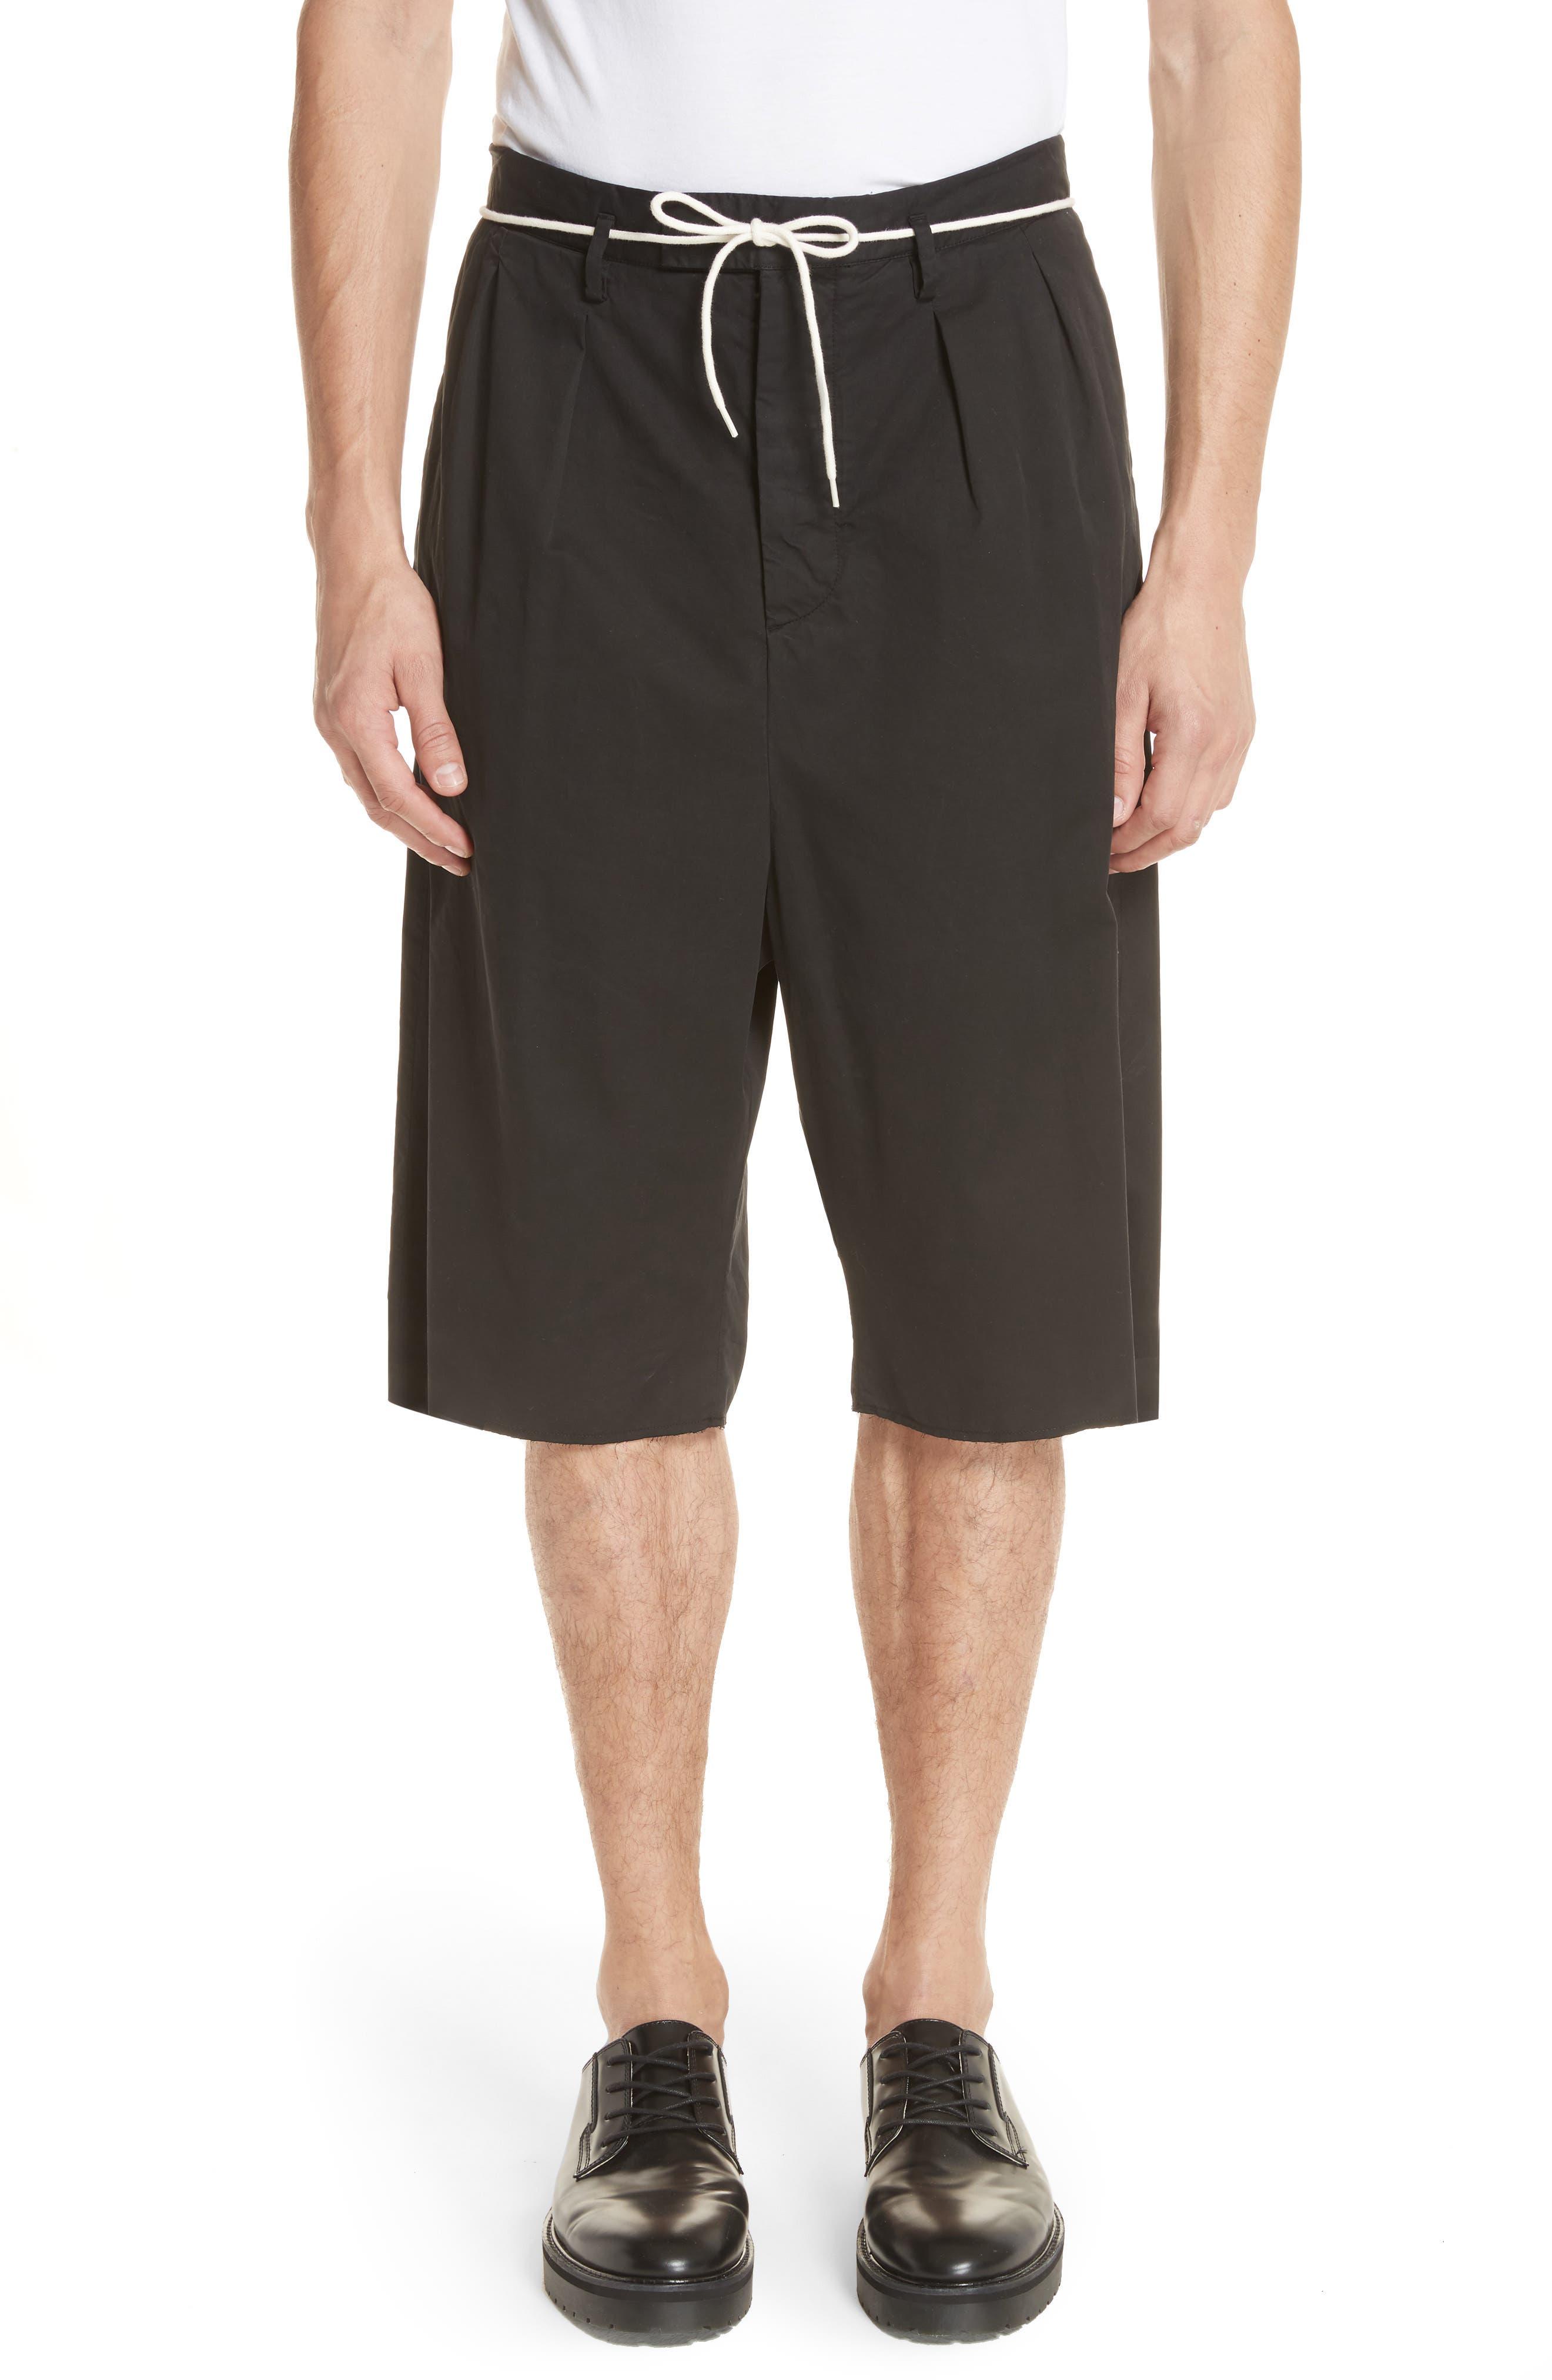 Maison Margiela Drop Crotch Shorts